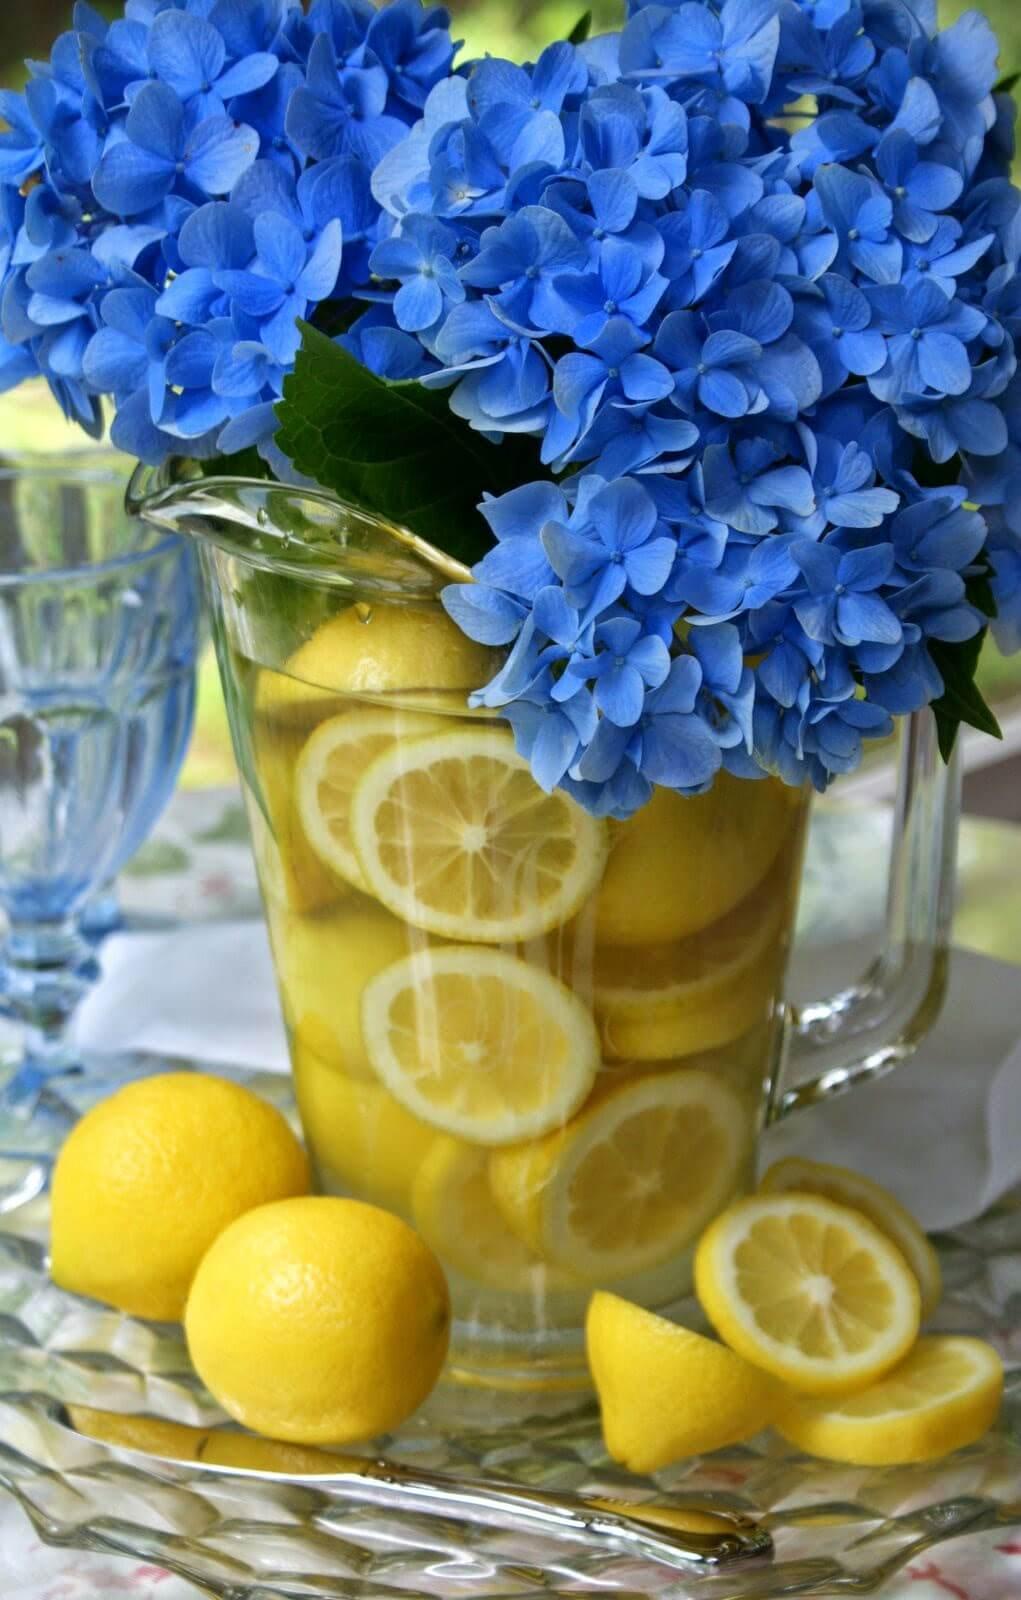 Bouquet Flower Arrangement with Sliced Lemon Vase